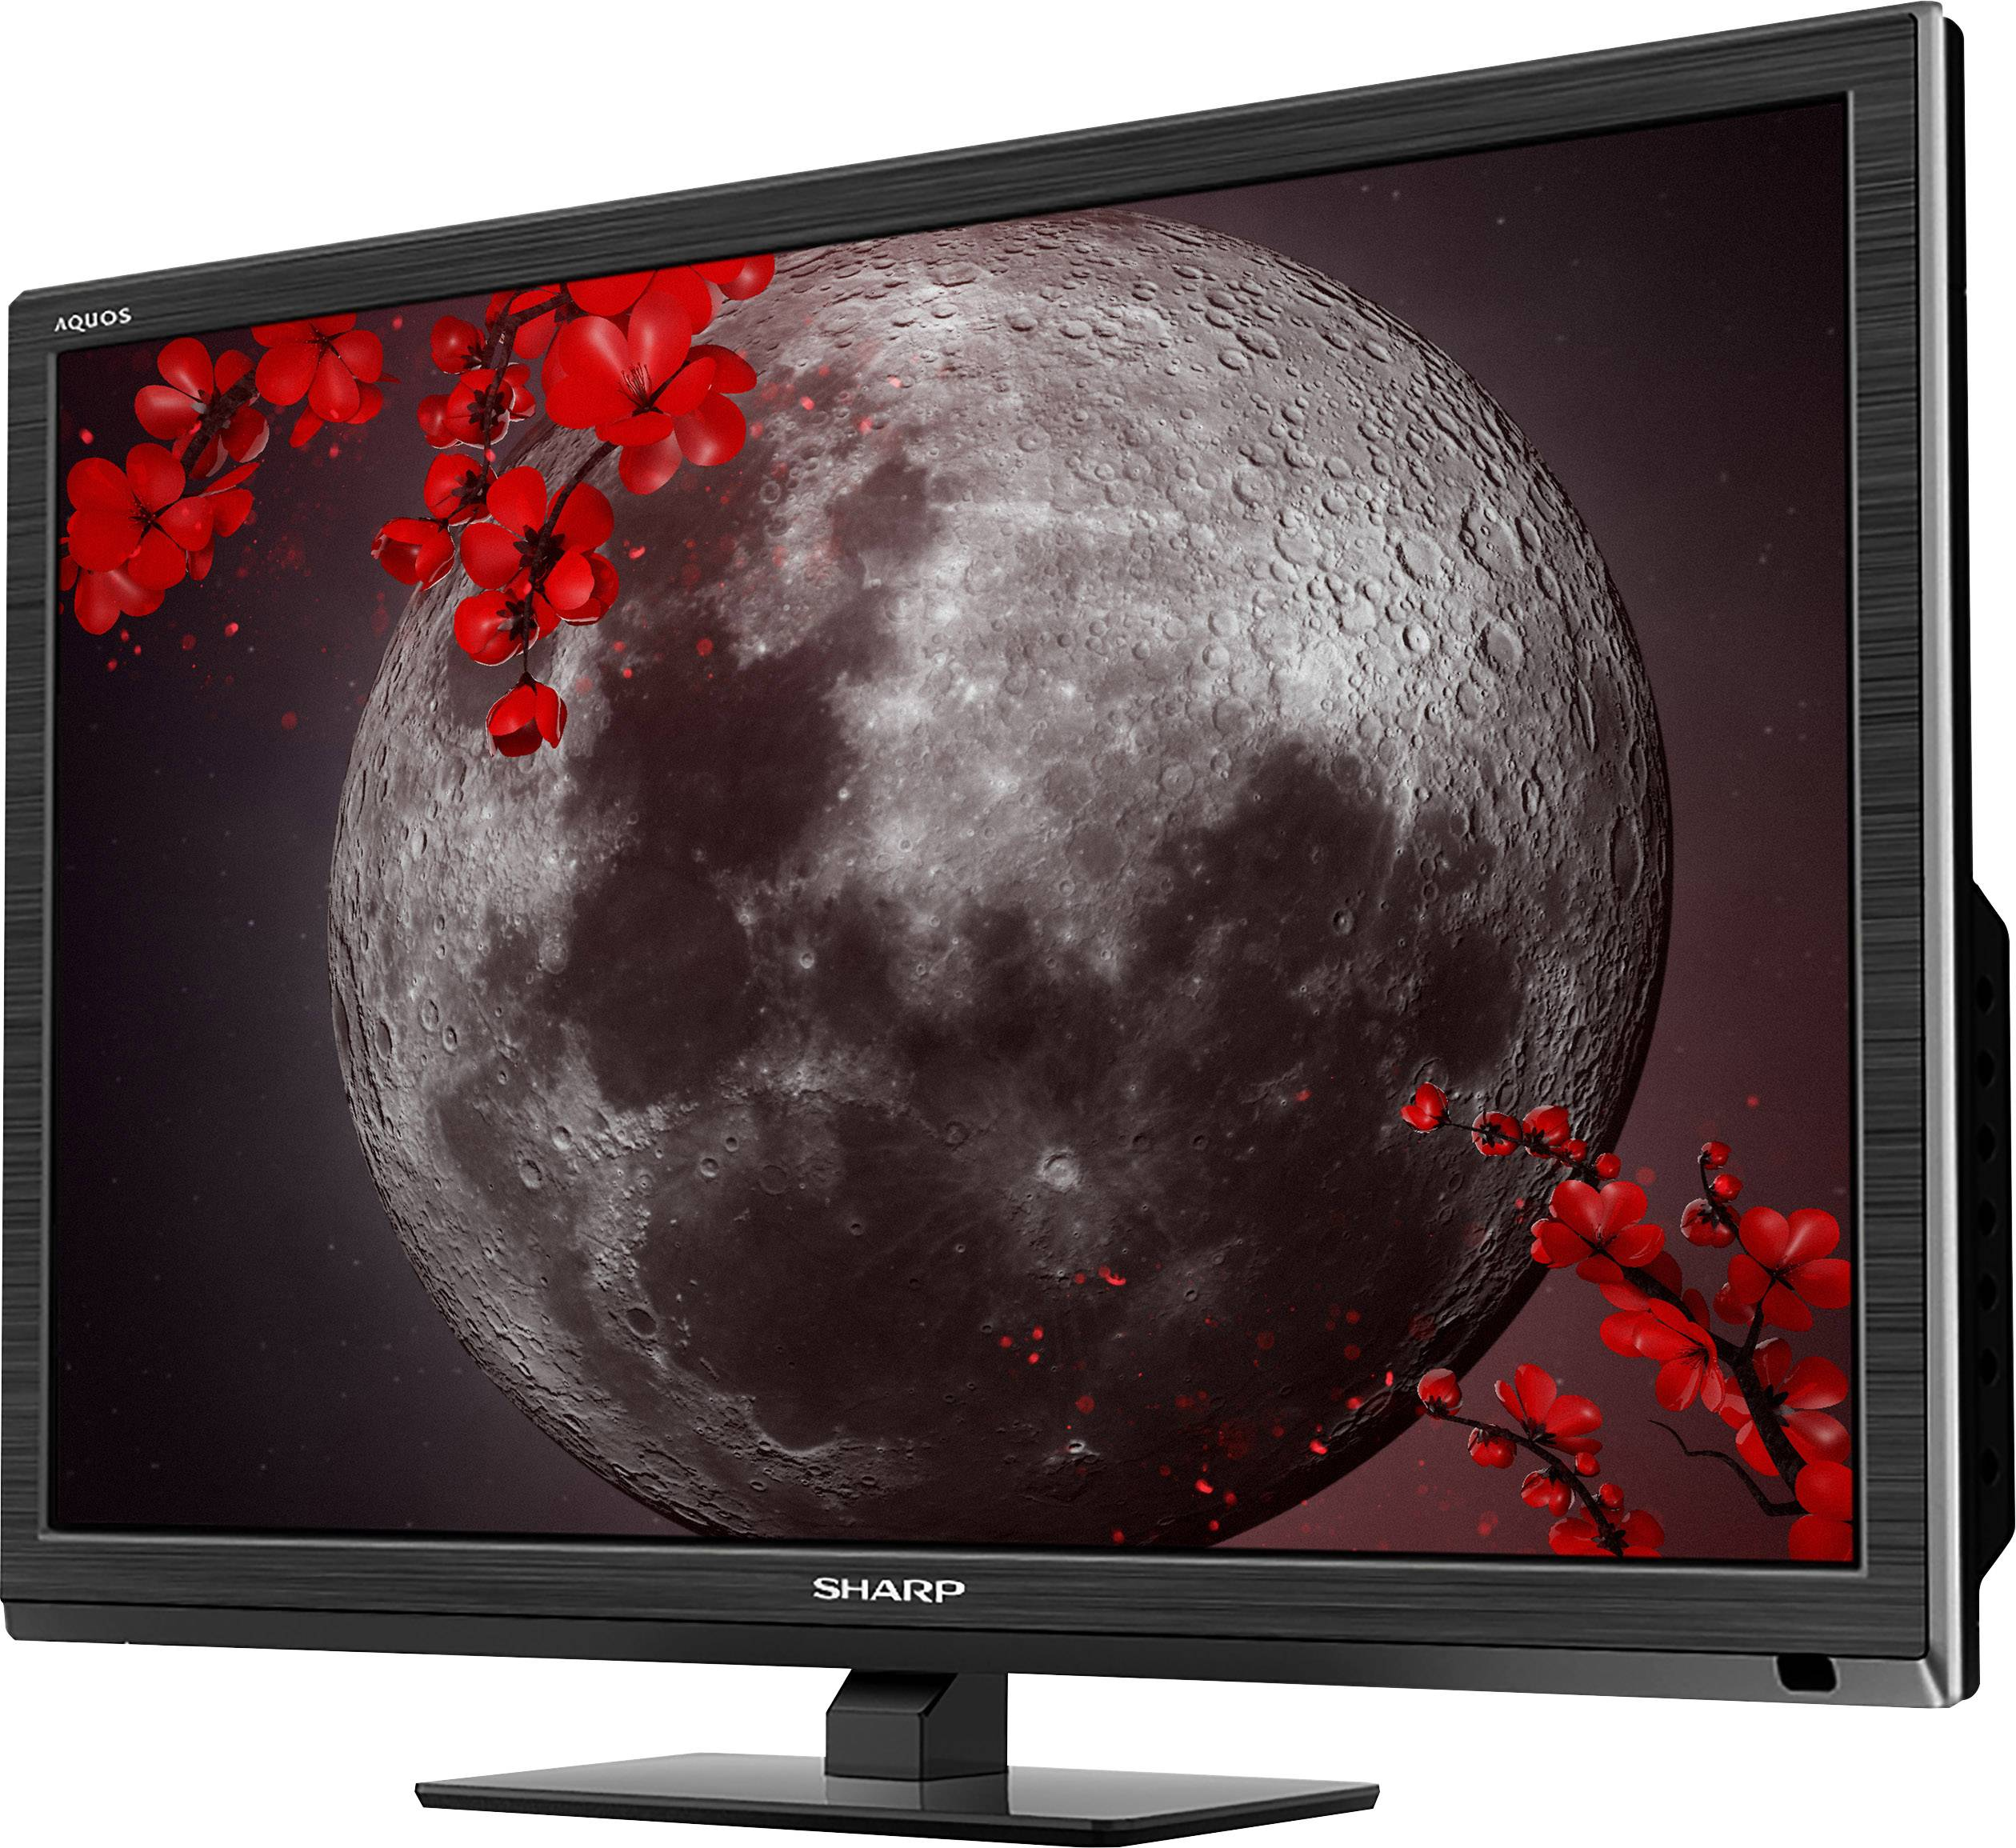 sharp lc 24chf4012e led tv 60 cm 24 inch eec a a e dvb t2 dvb c dvb s hd ready ci black